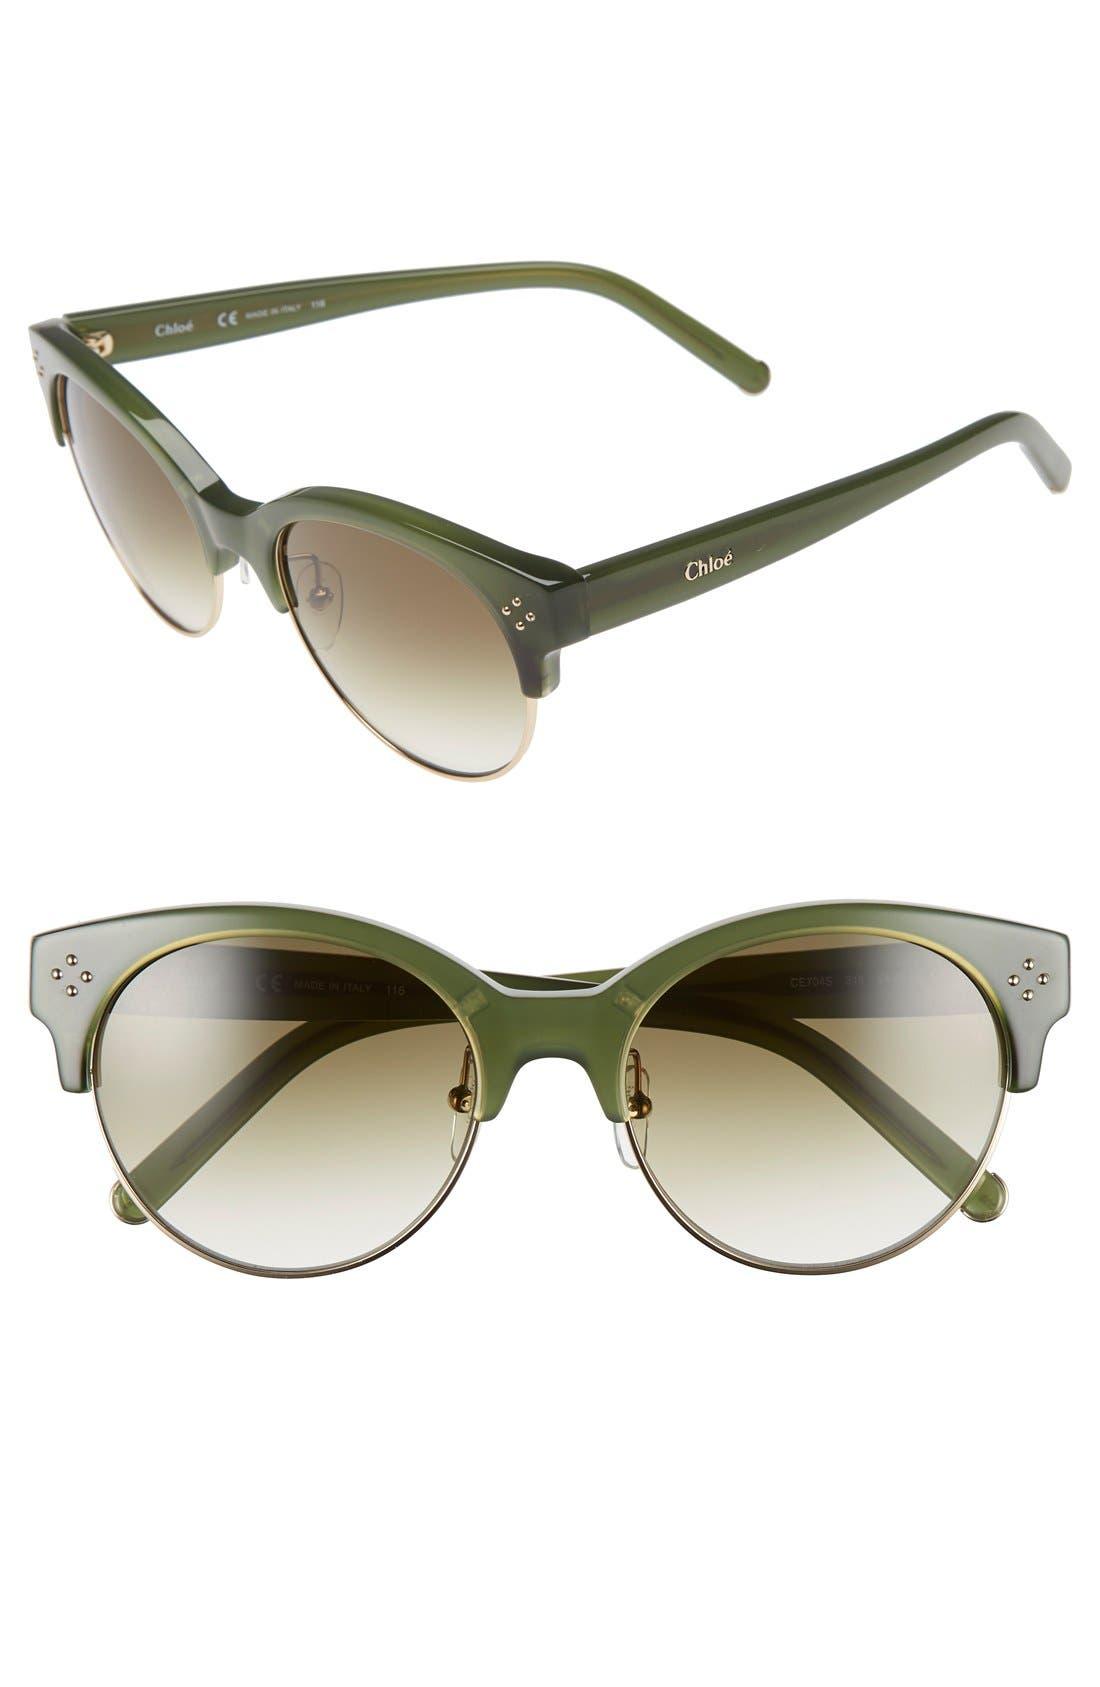 Chloé 'Boxwood' 54mm Sunglasses